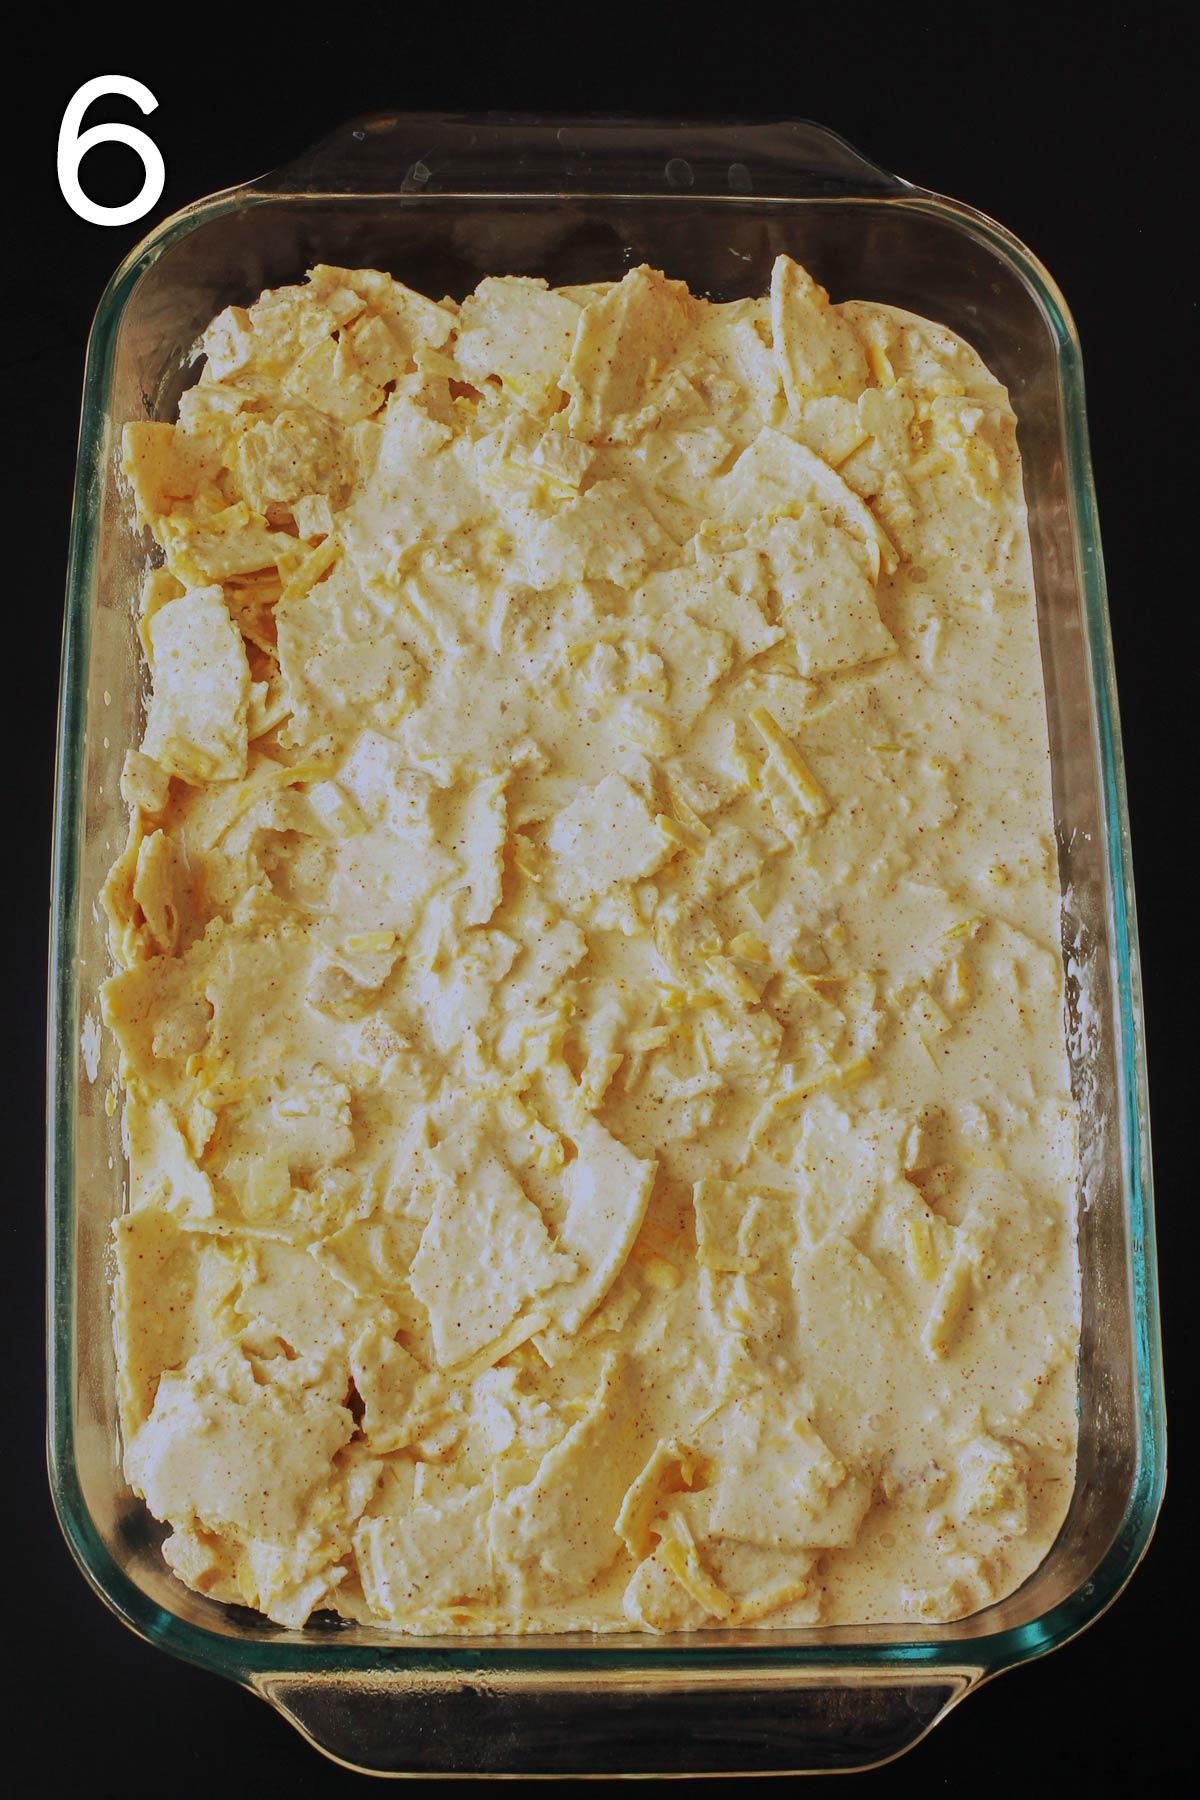 tortilla mixture spread in the pan.